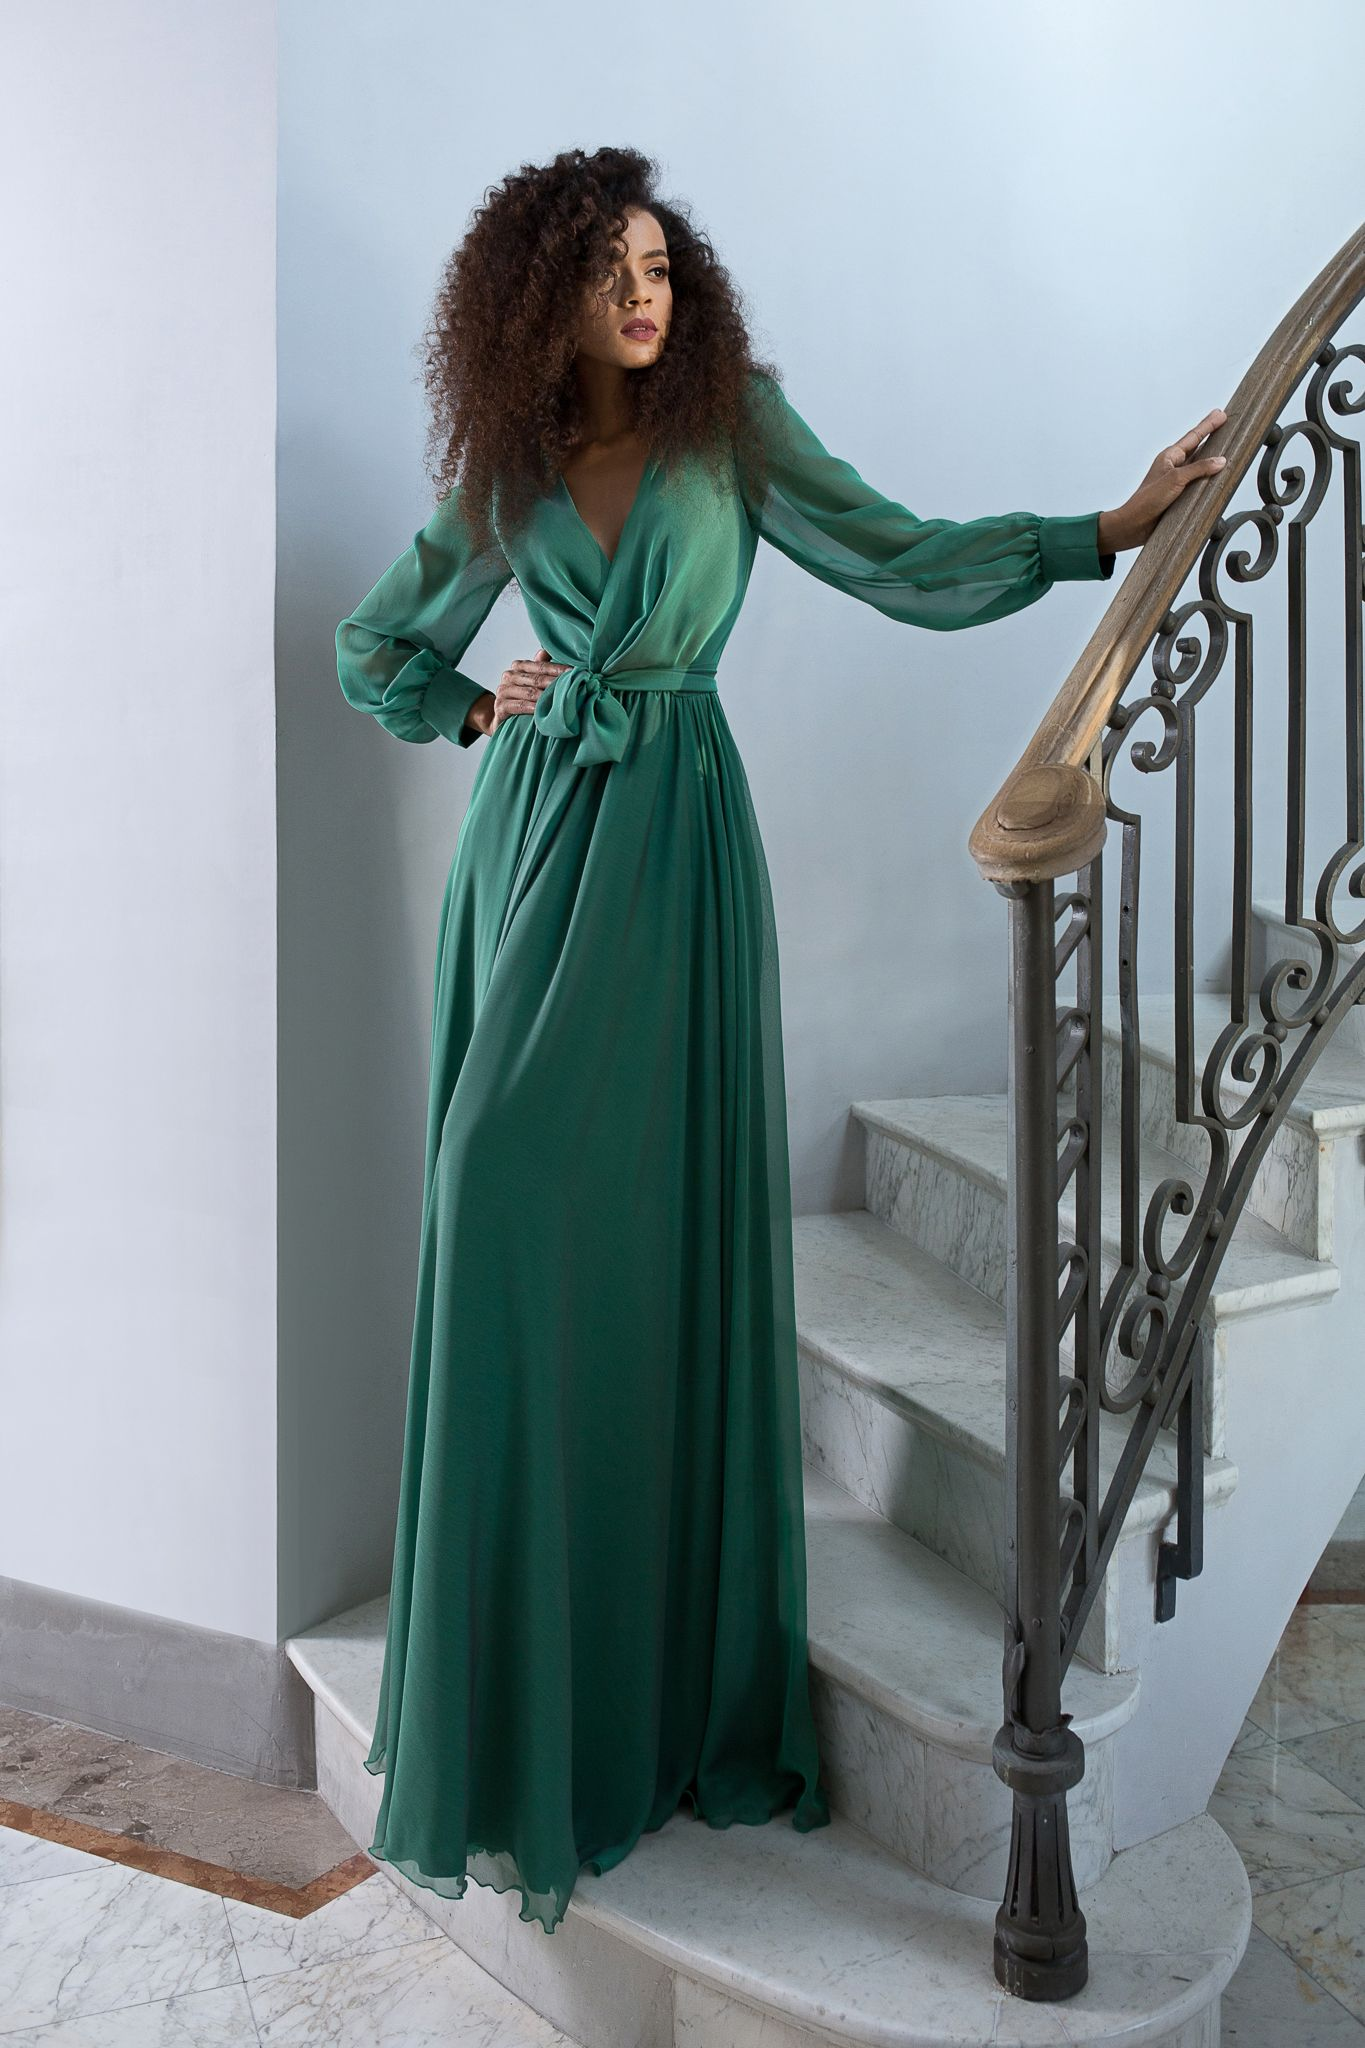 Emerald Green Silk Dress With Bishop Sleeves Maigre Couture Green Long Sleeve Dress Emerald Green Wedding Dress Maxi Dress Green [ 2048 x 1365 Pixel ]